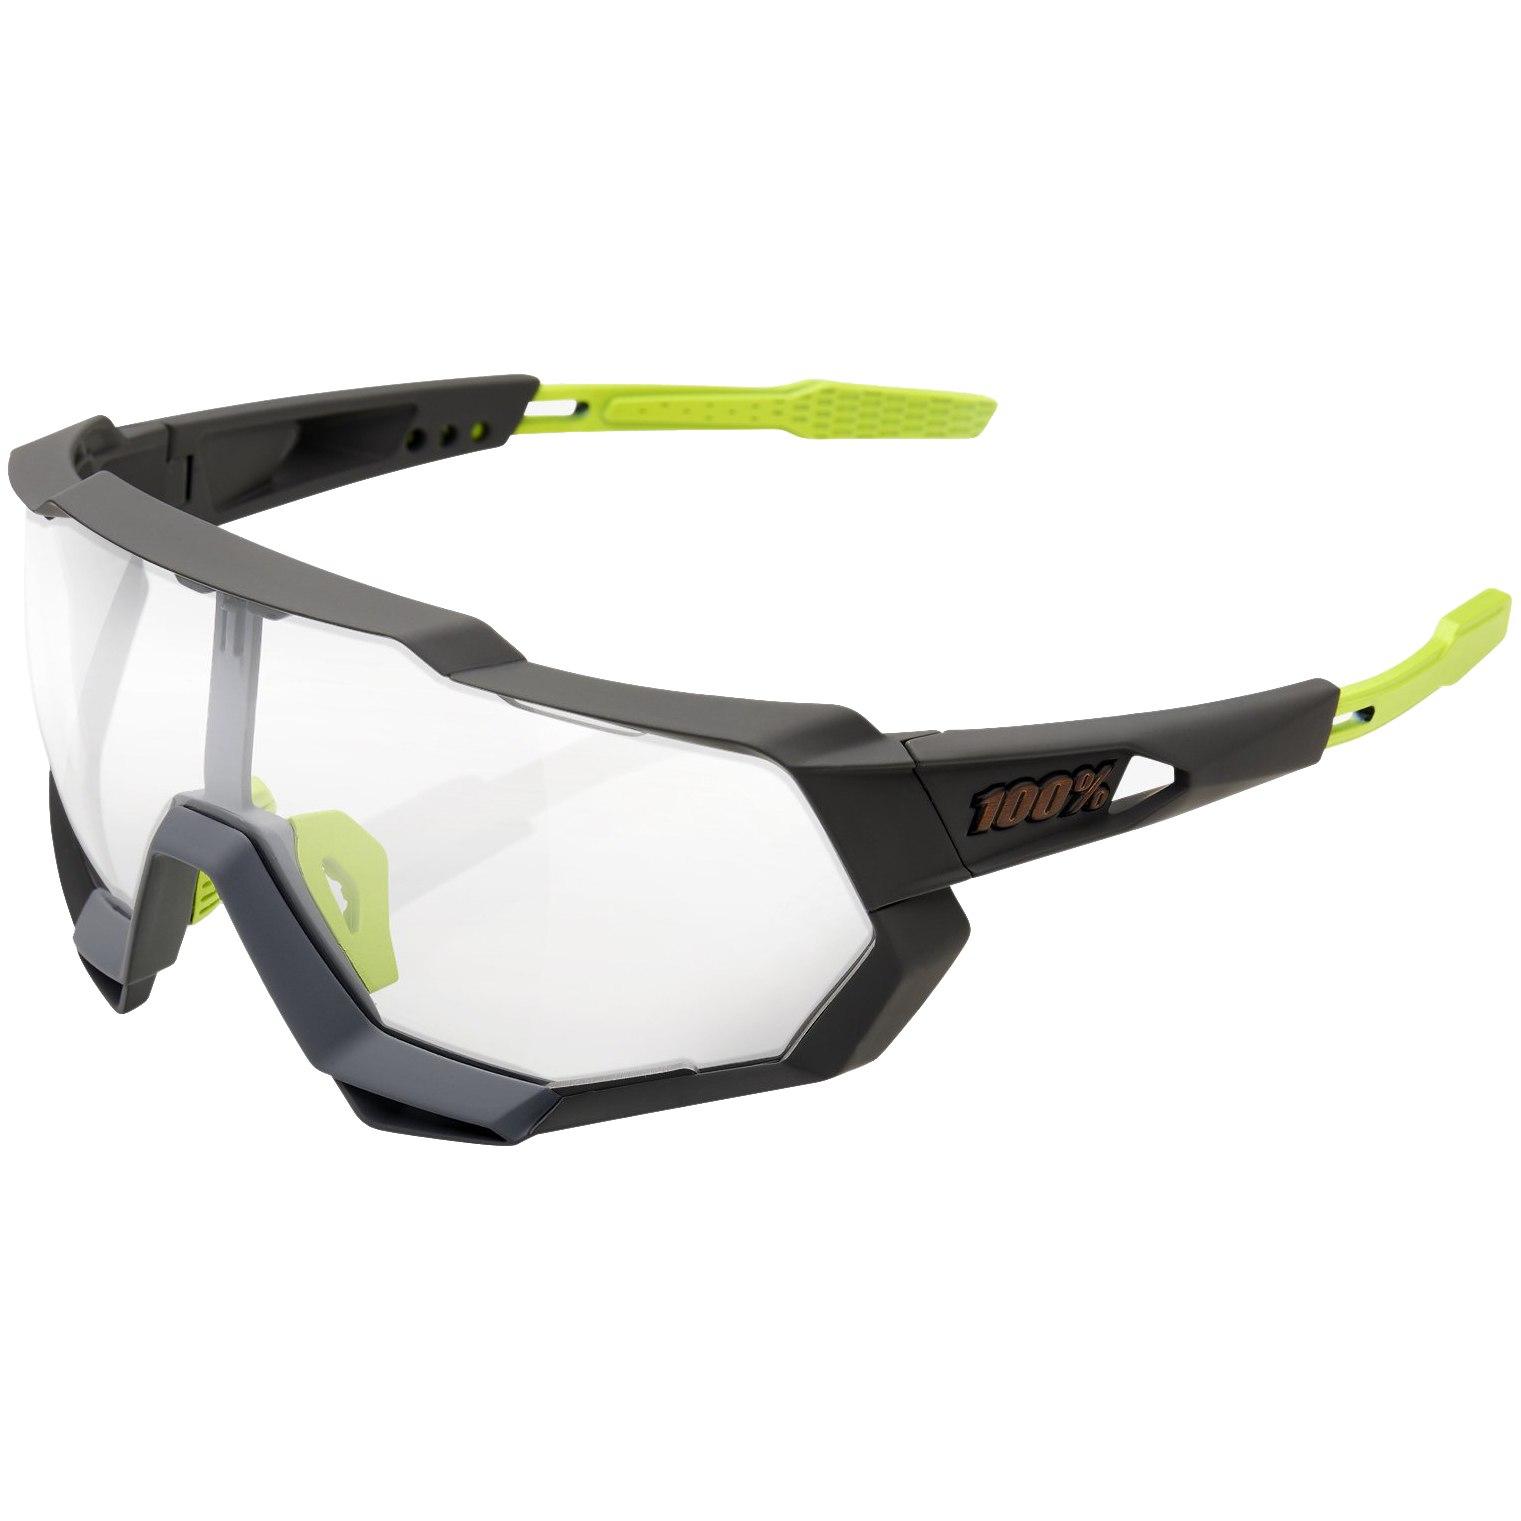 100% Speedtrap Photochromic Lens Glasses - Soft Tact Cool Grey